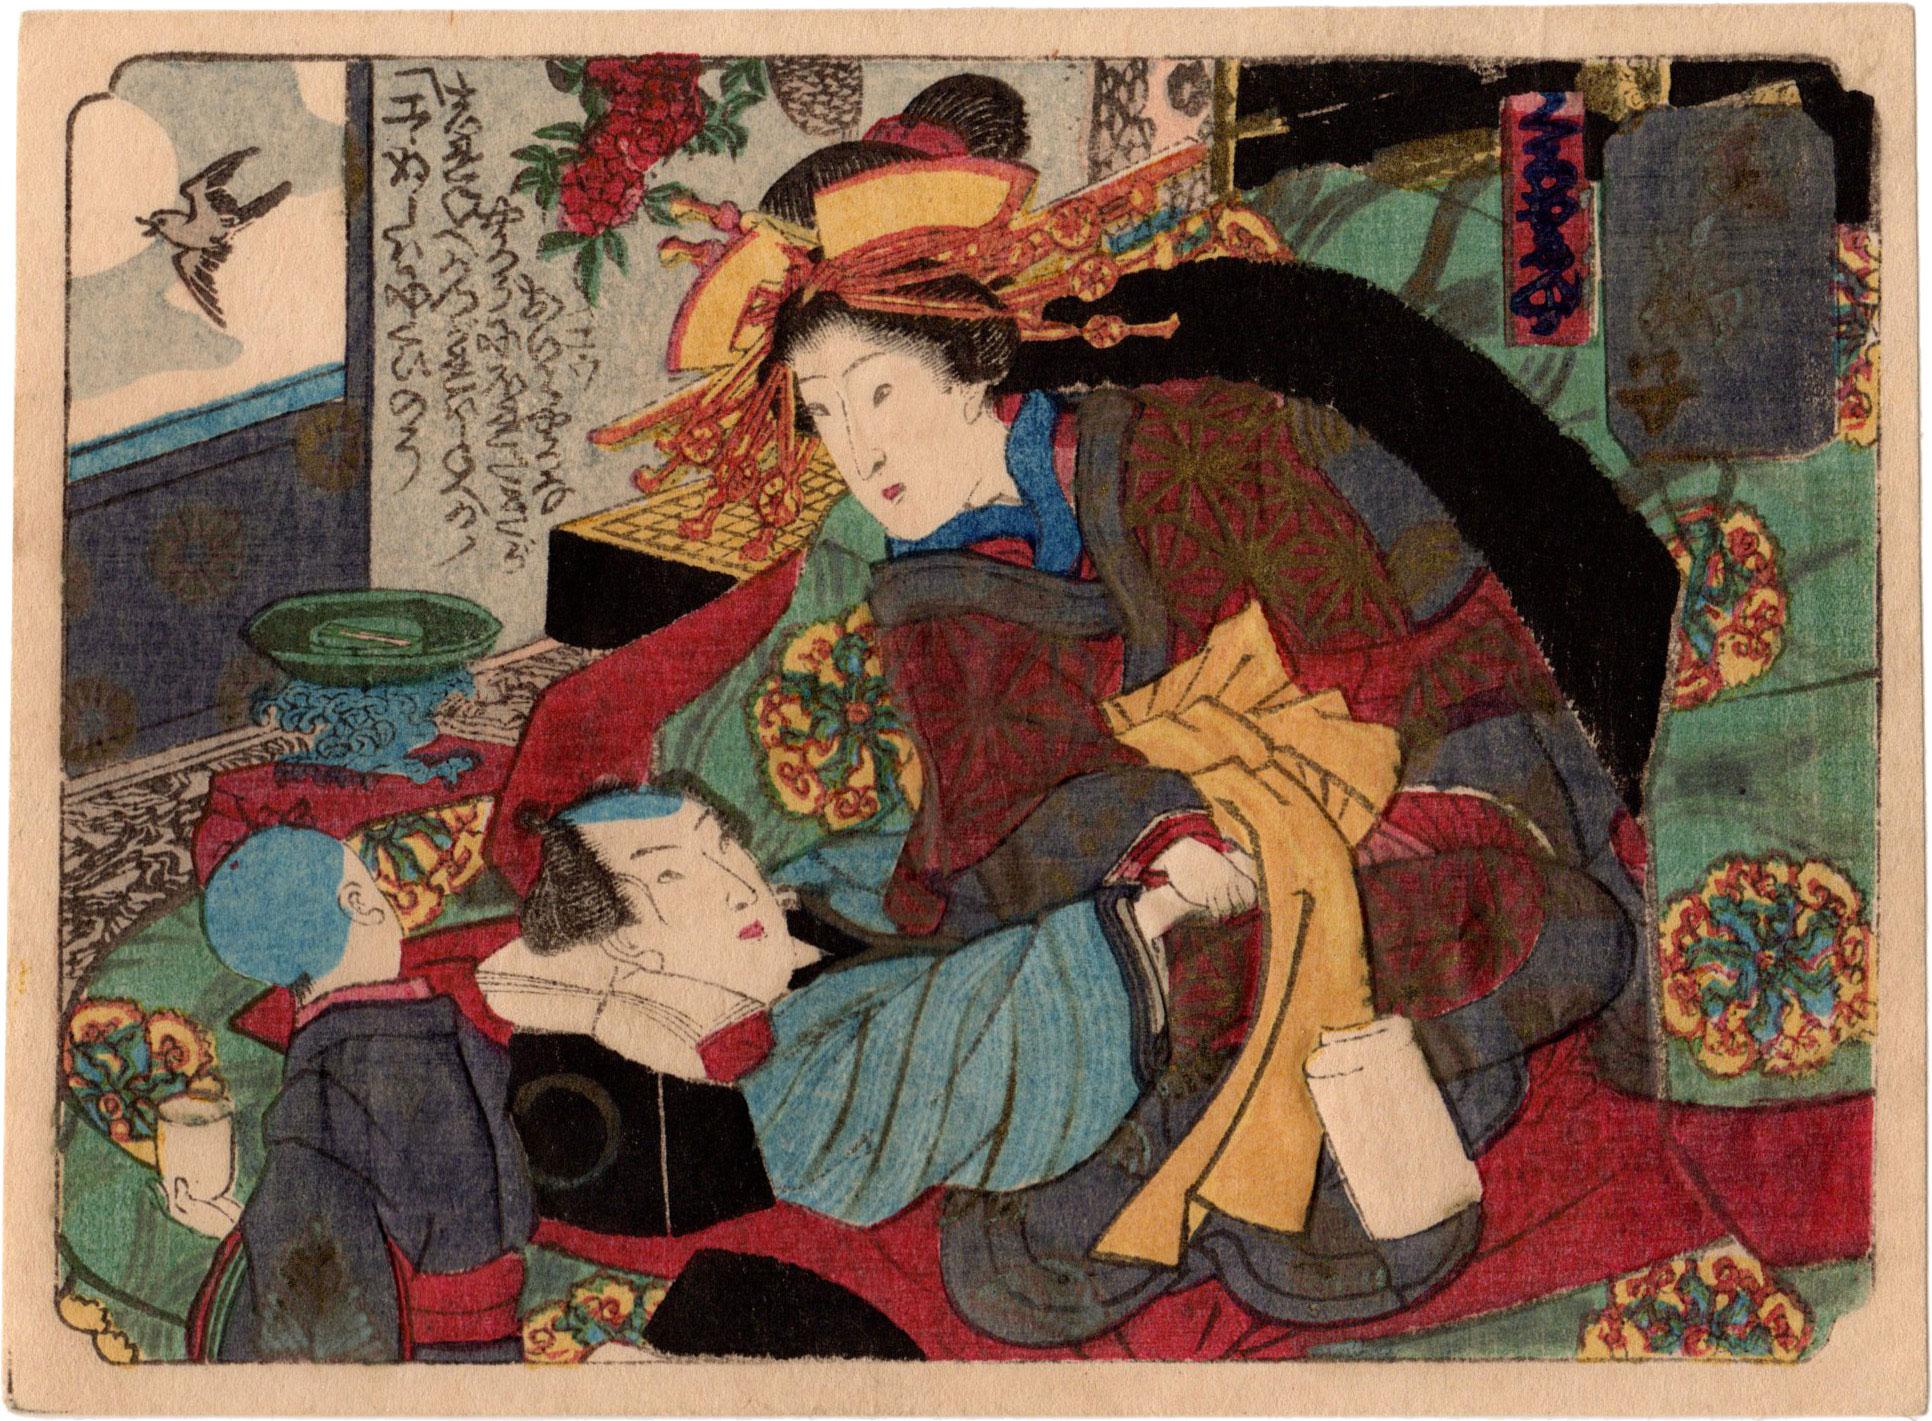 BROCADE PICTURE 01 (Utagawa School)